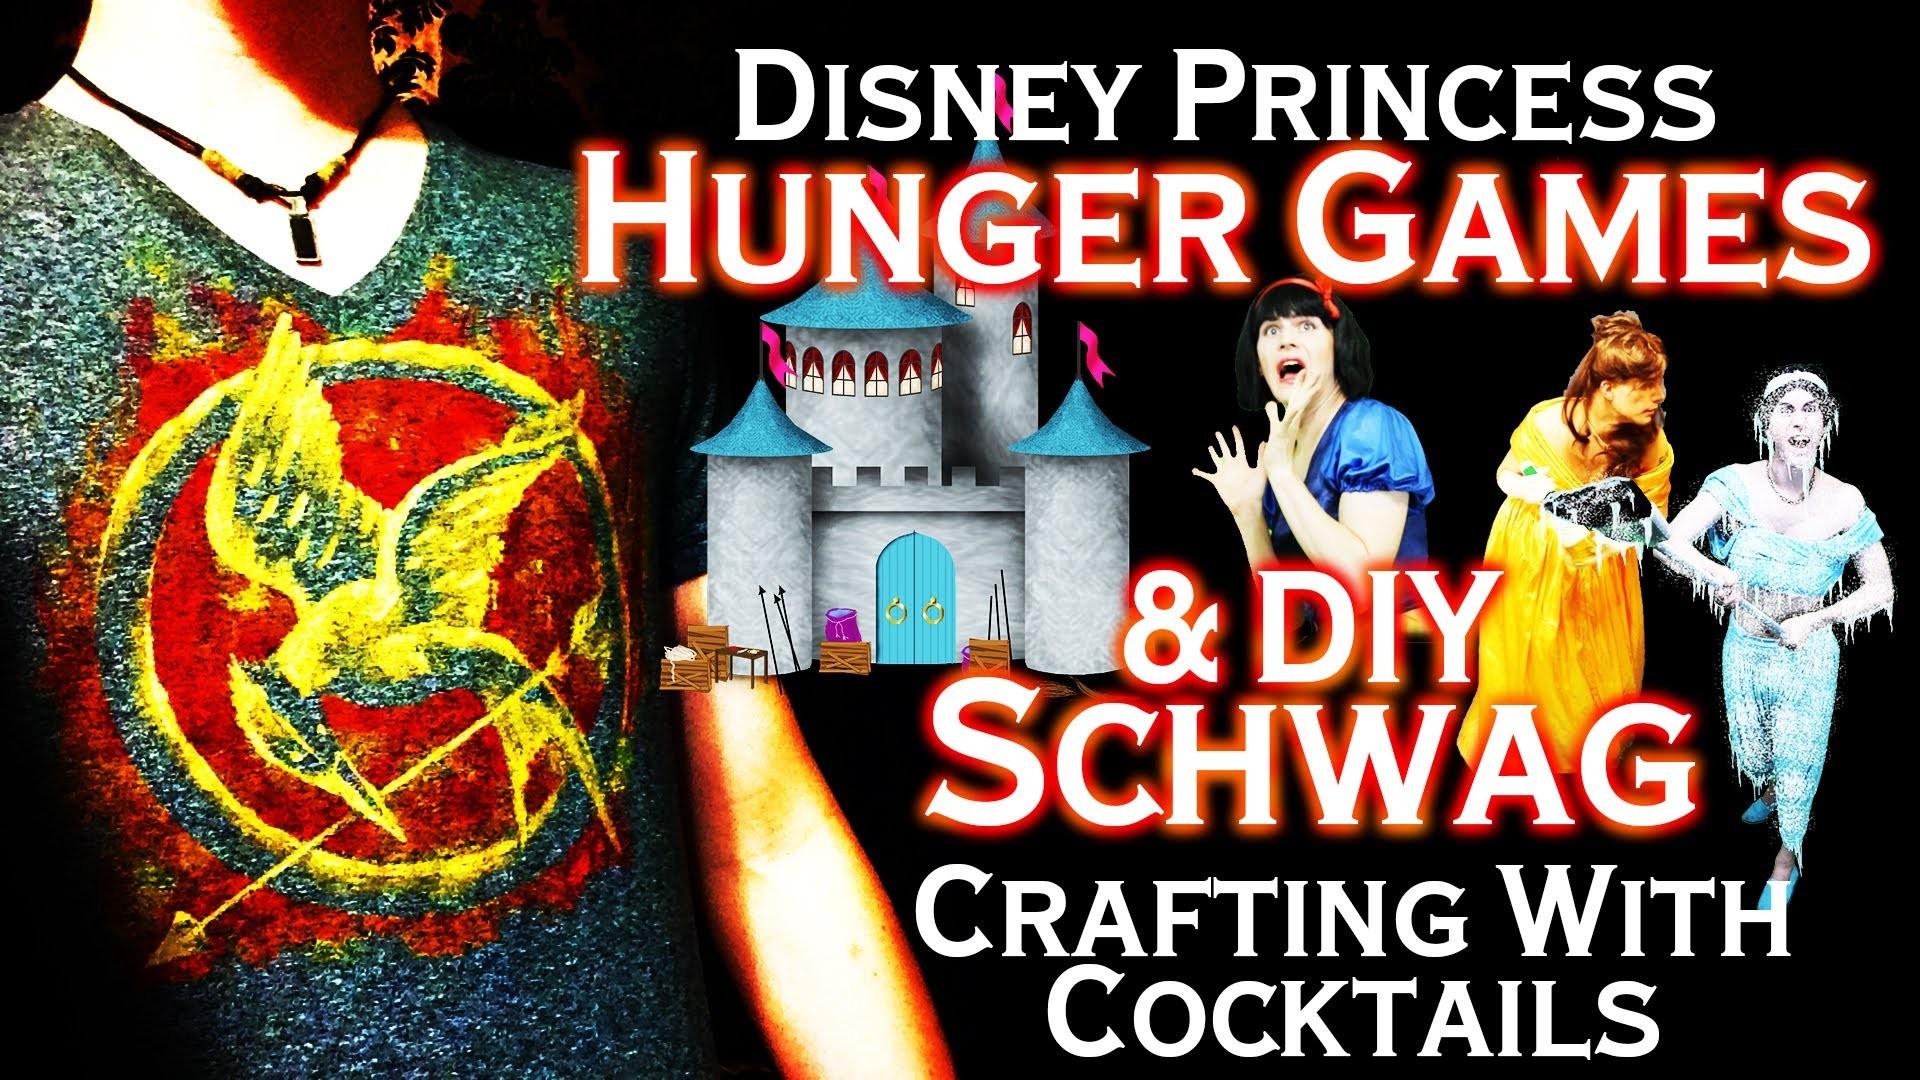 Disney Princess Hunger Games - DIY Hunger Games Schwag - Crafting With Cocktails (3.07)